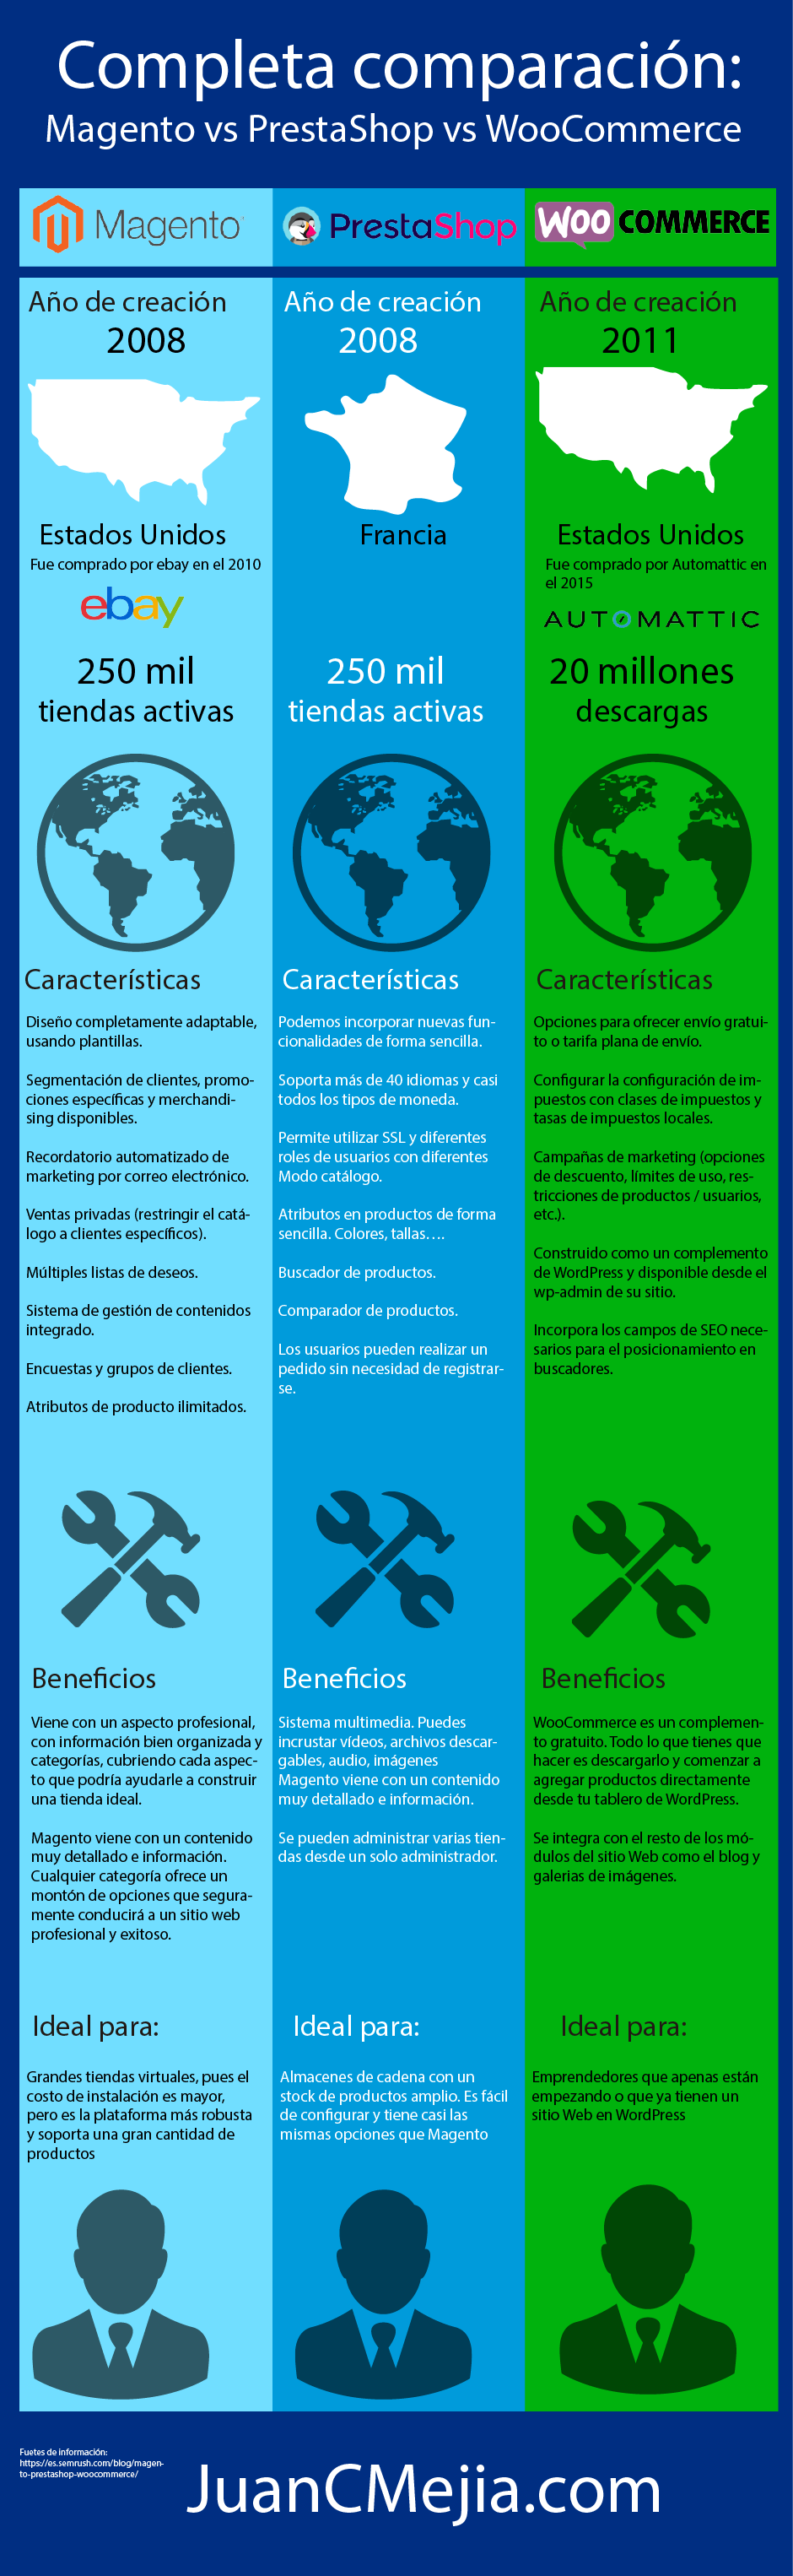 Magento-vs-PrestaShop-vs-WooCommerce-Infografía